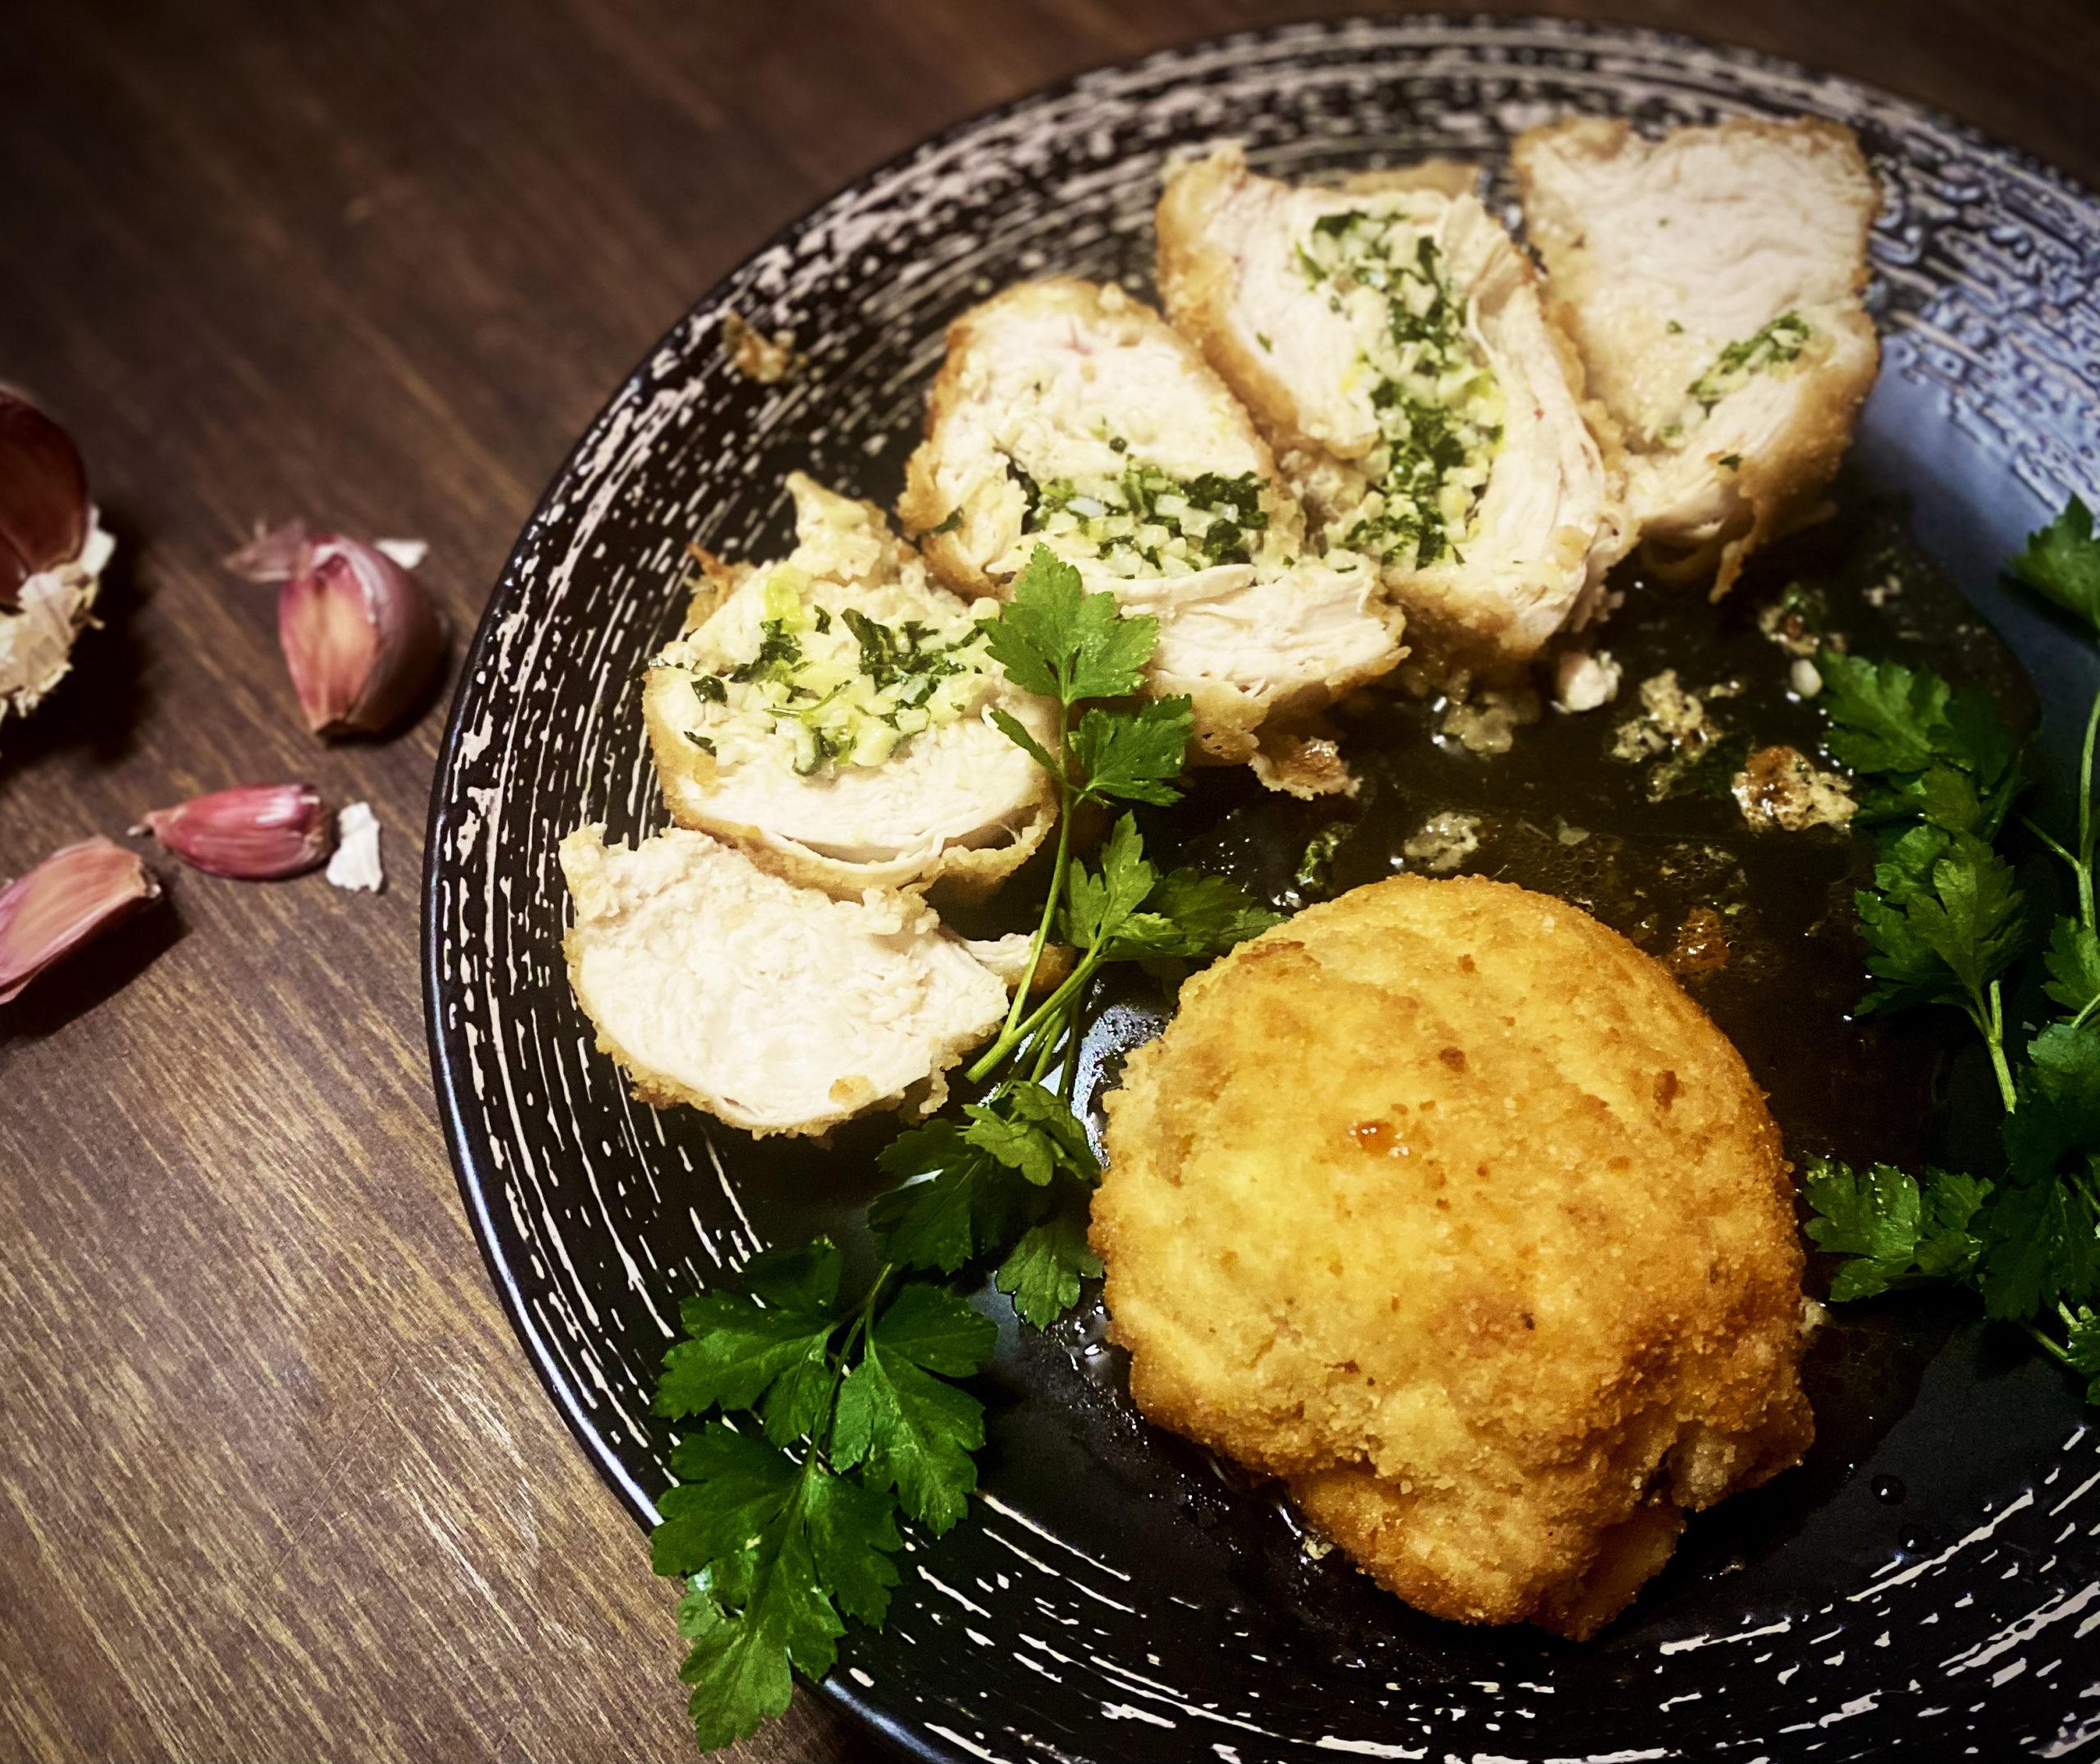 TGIFOOD: Throwback Thursday: Chicken Kiev